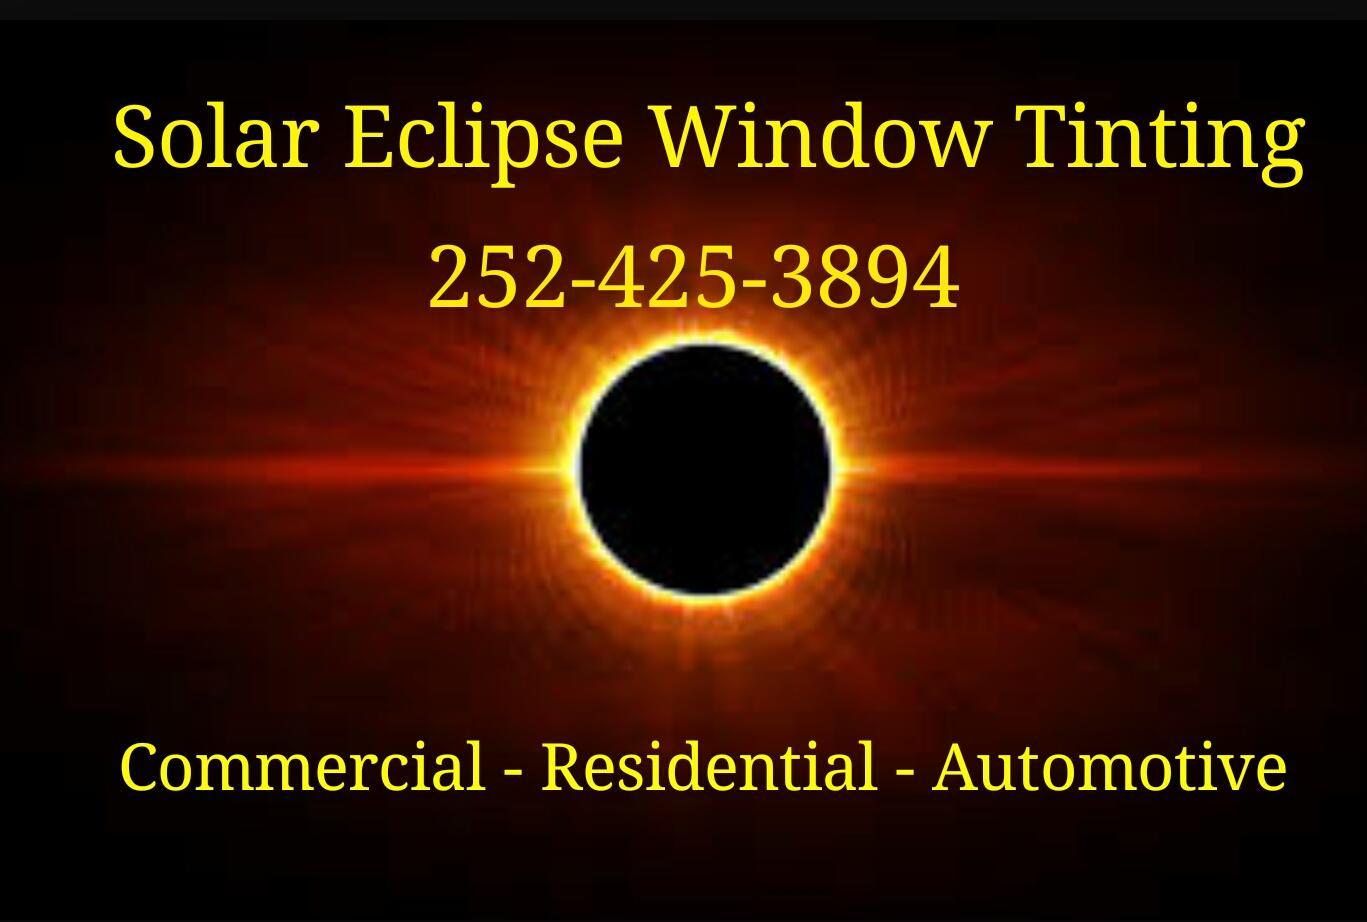 Solar Eclipse Window Tinting image 0